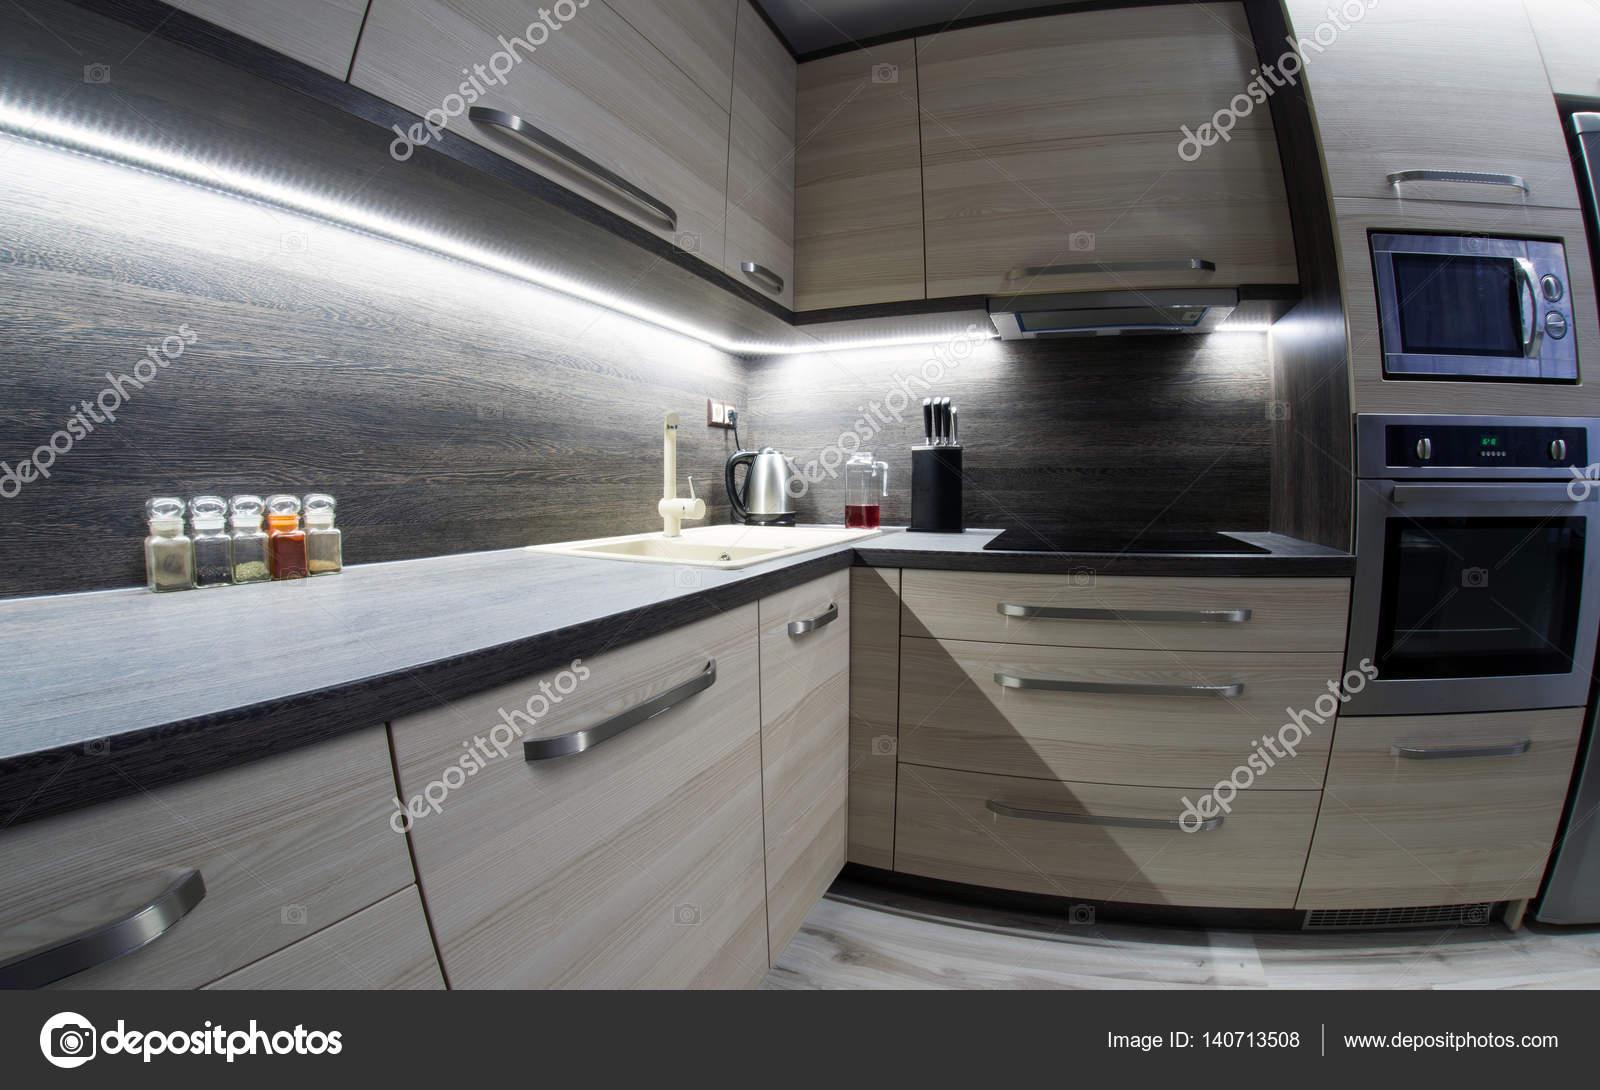 muebles de cocina moderna — Foto de stock © jarino #140713508